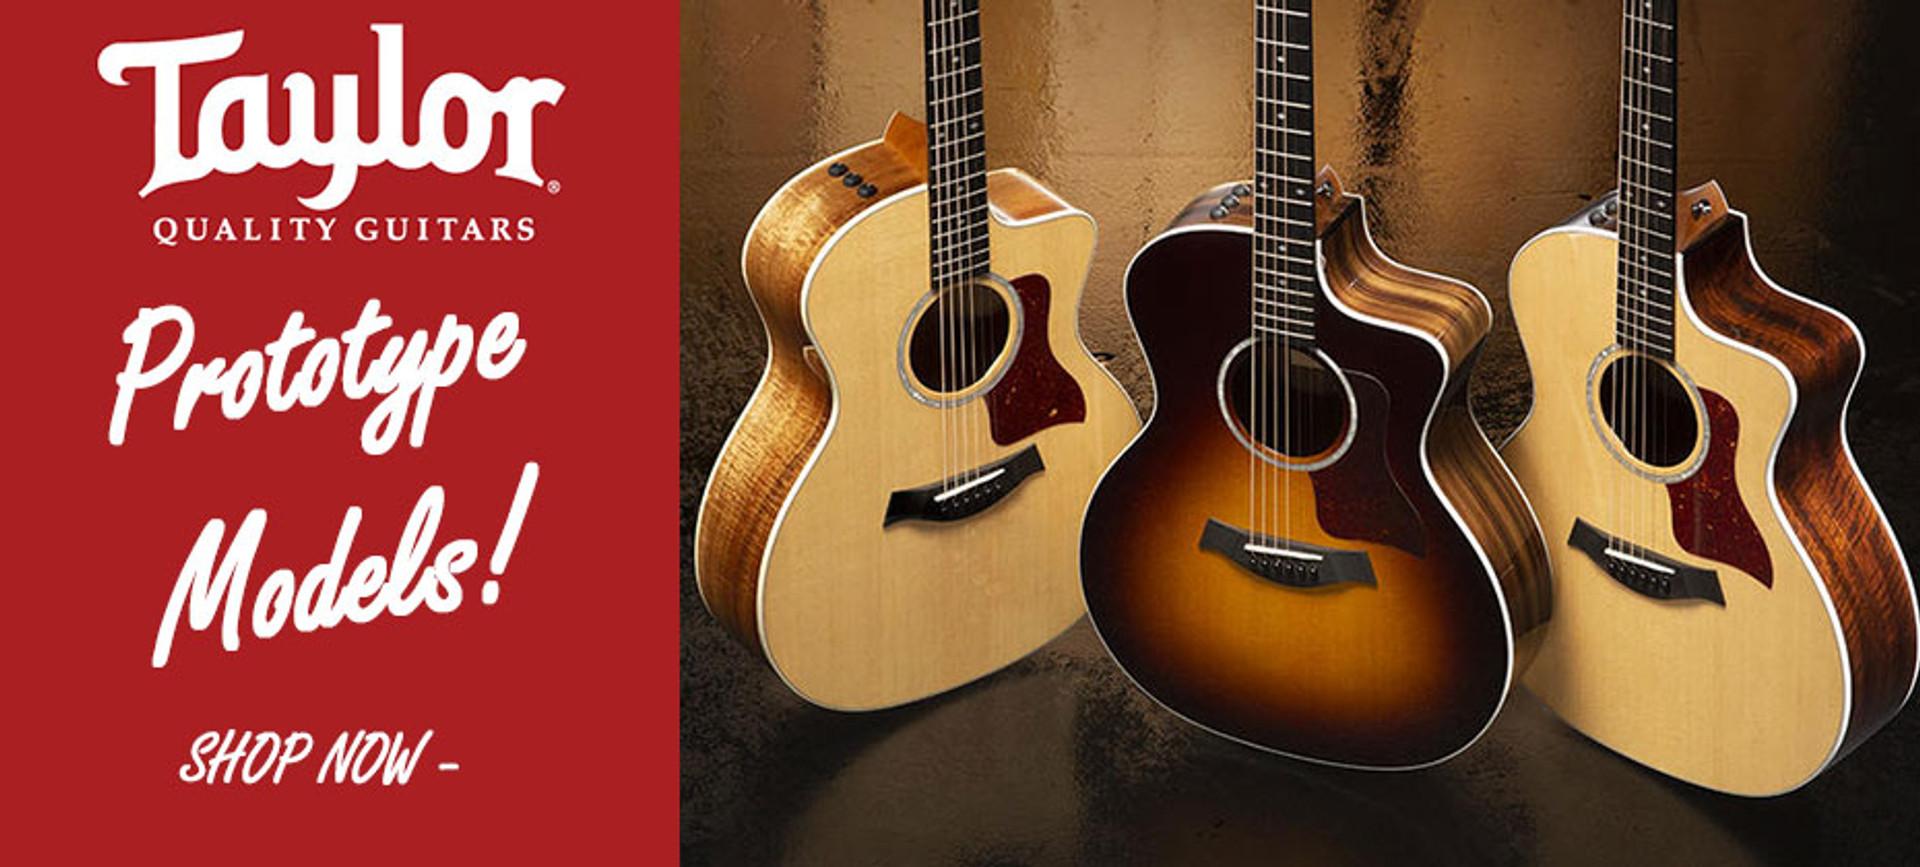 Taylor Acoustic Guitar Dealer